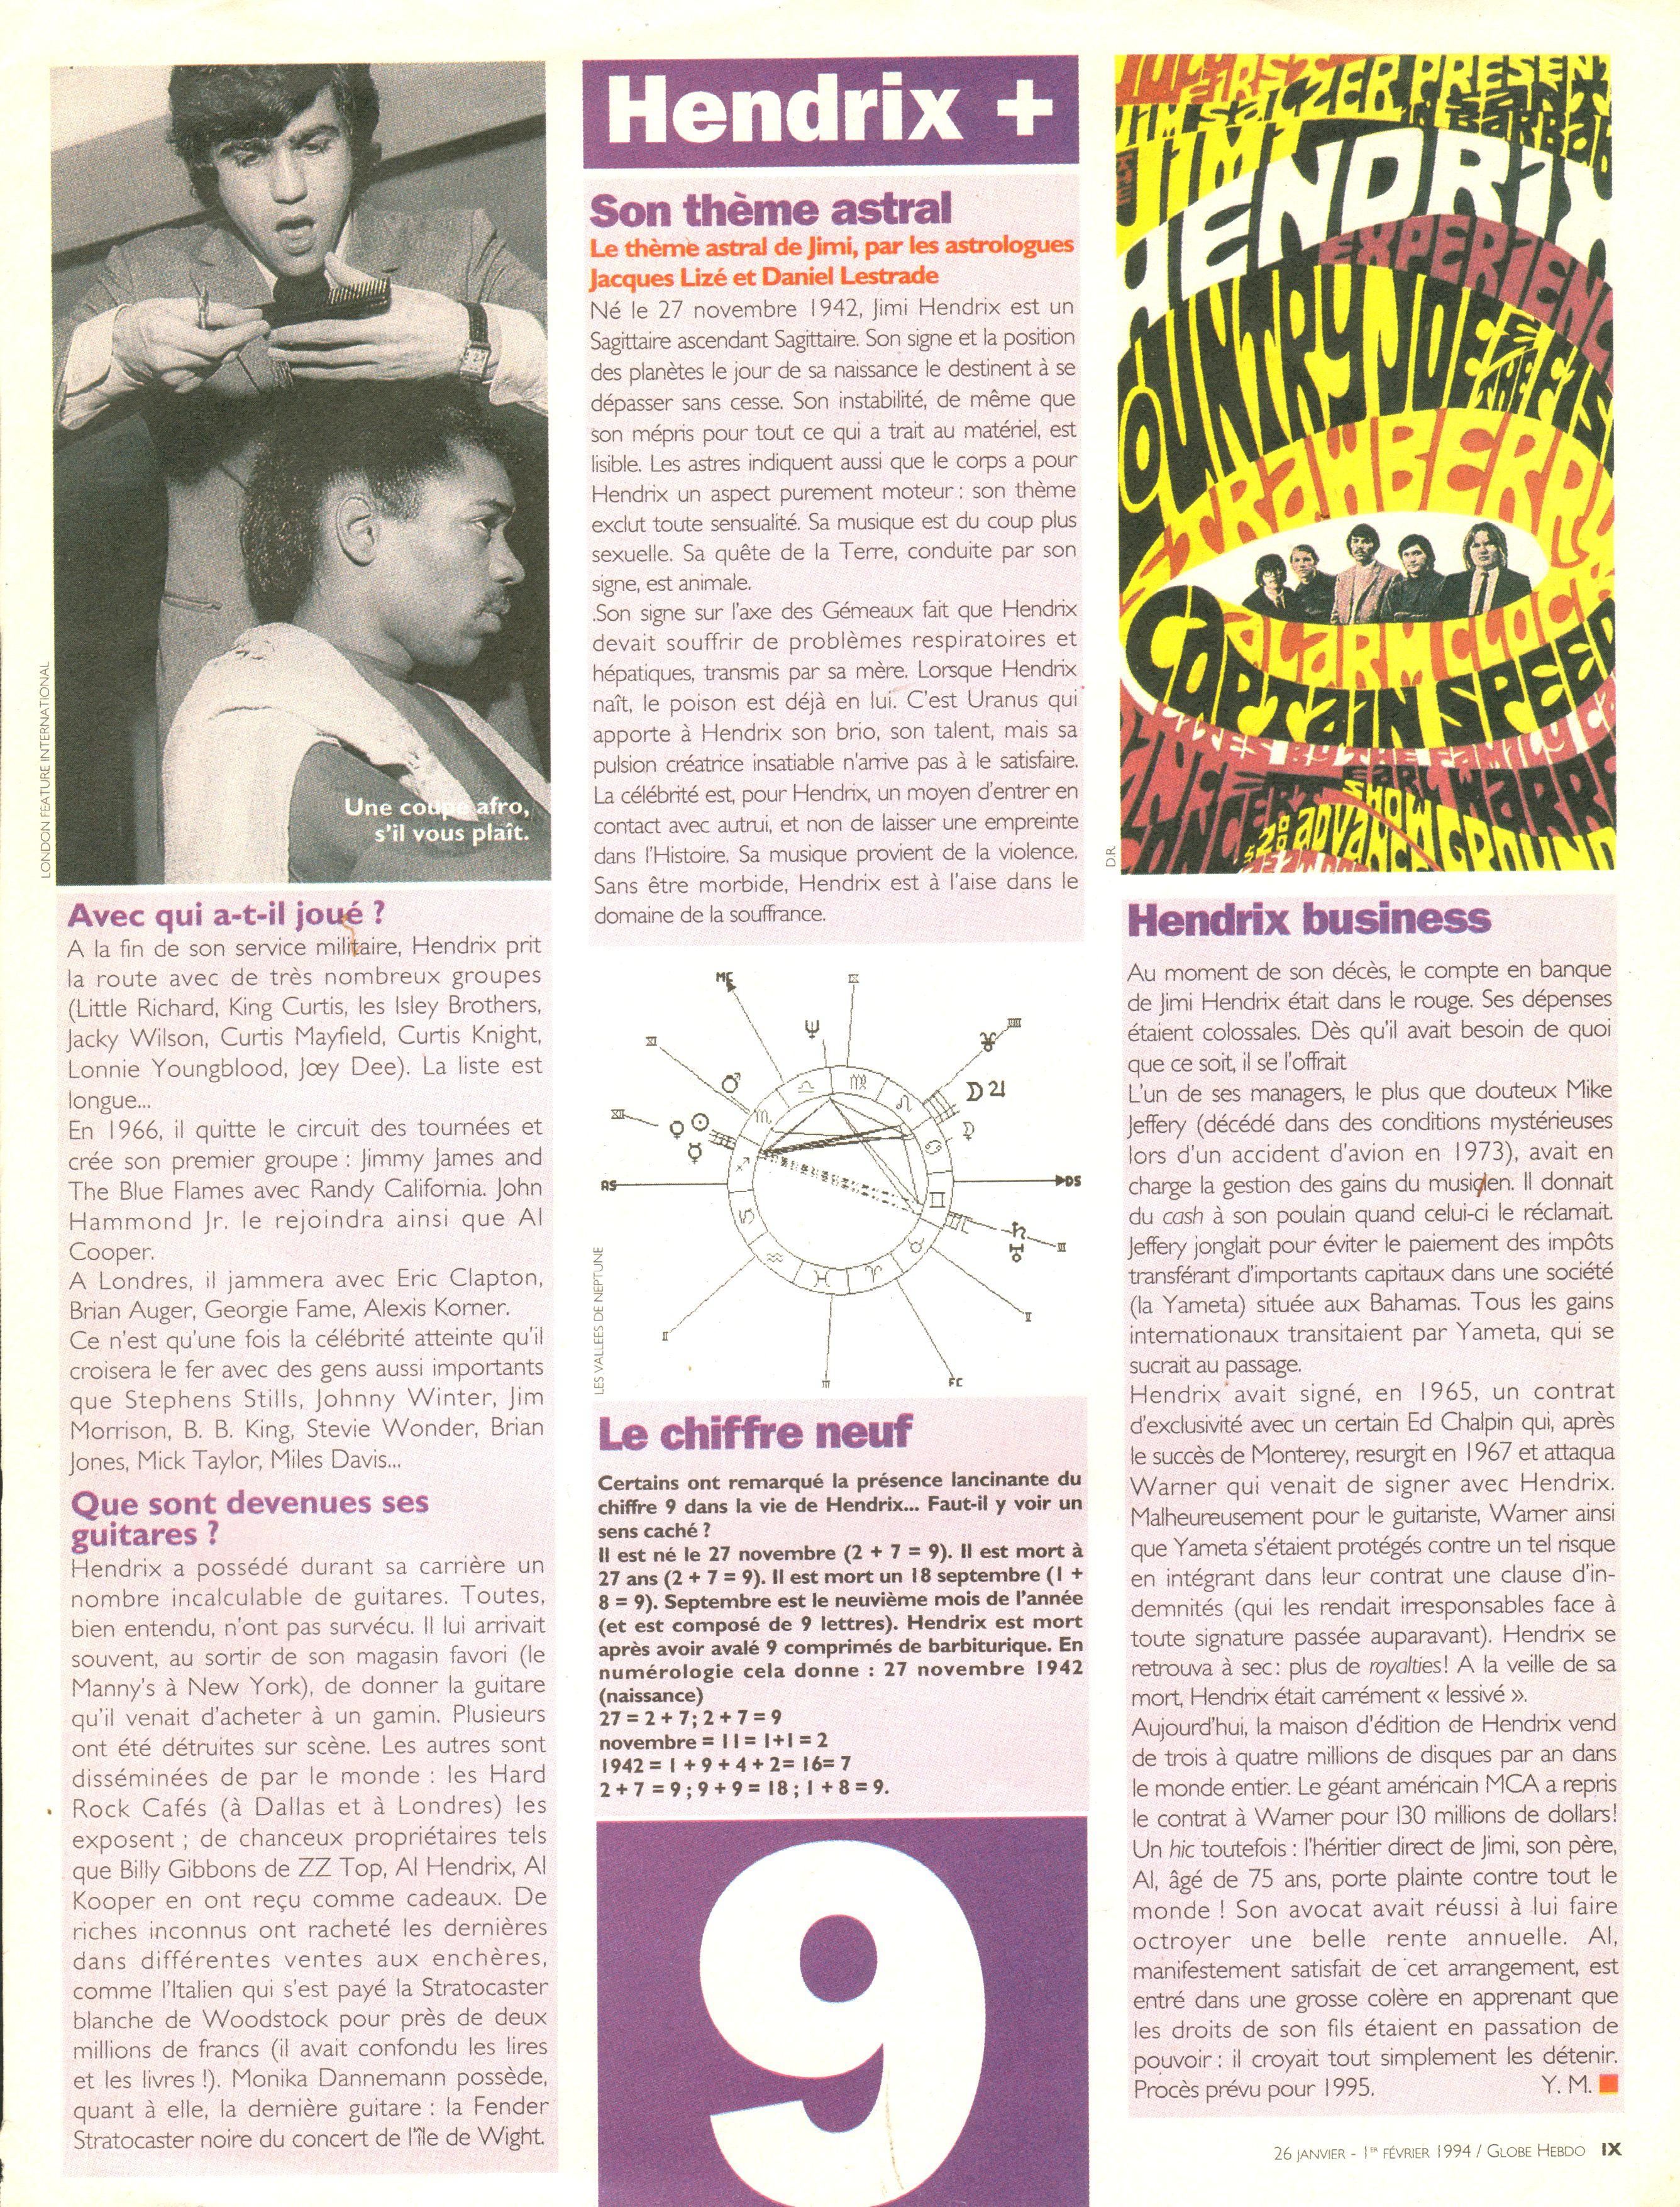 Magazines Français 1989 - 2014 GlobeHebdo26Janvier1reFevrier1994Page09